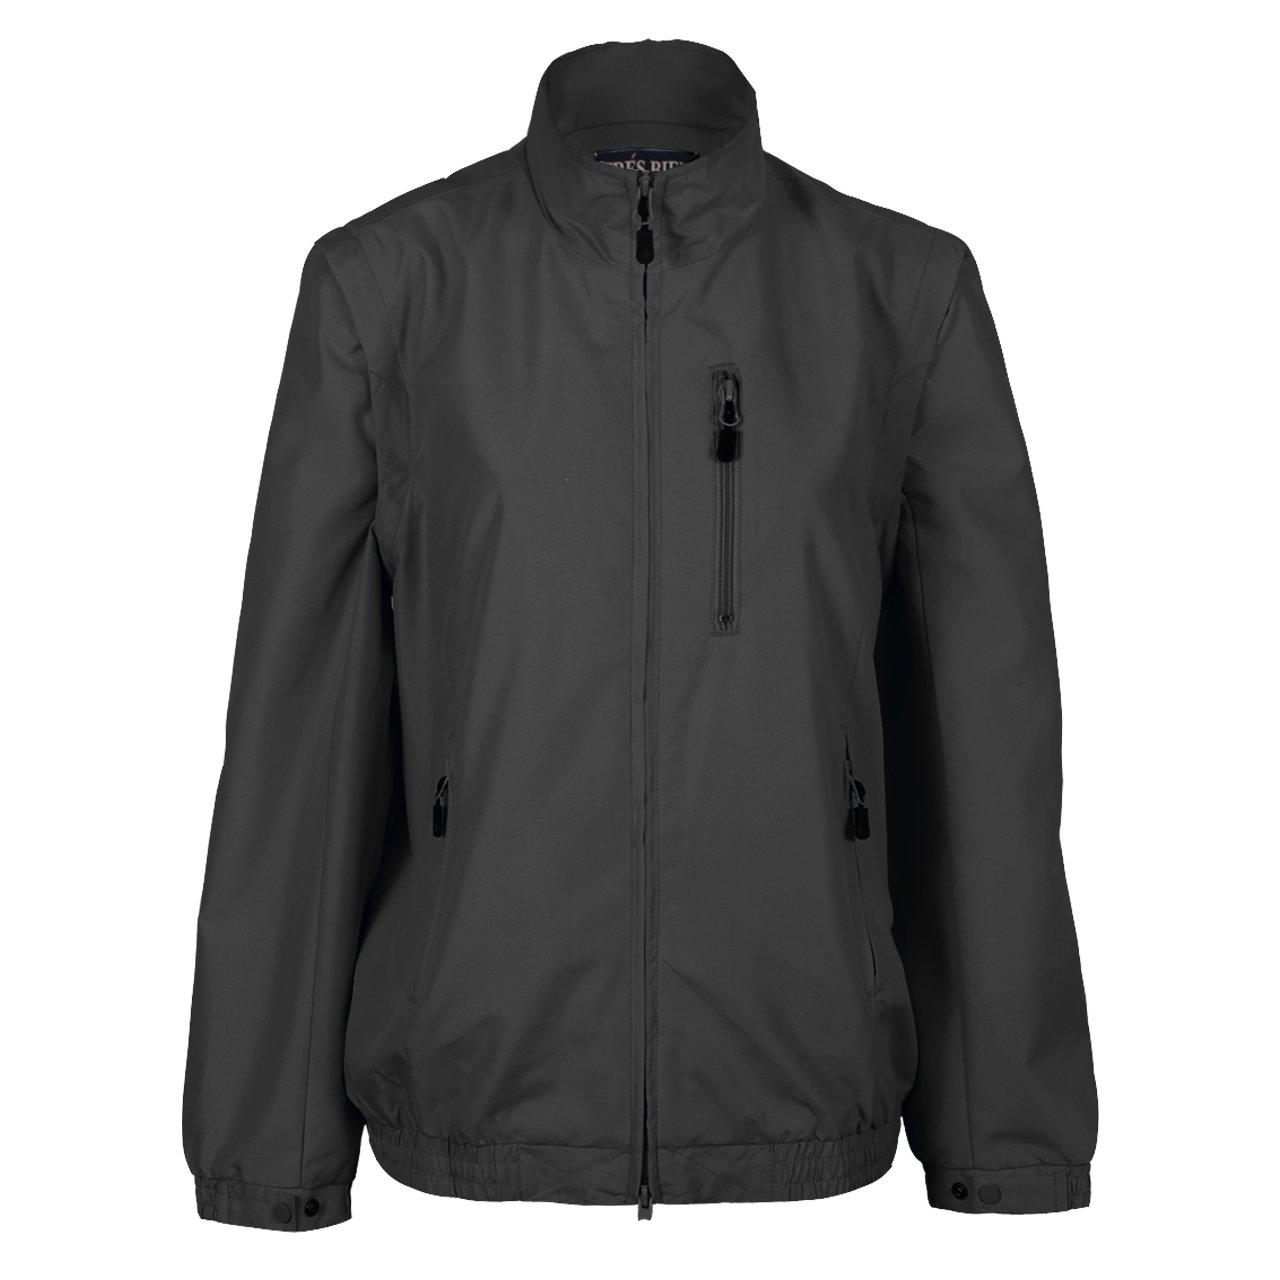 Tres Bien Golf Women's 2 in 1 Convertible Jacket/Vest (Small, Black) by Tres Bien Golf